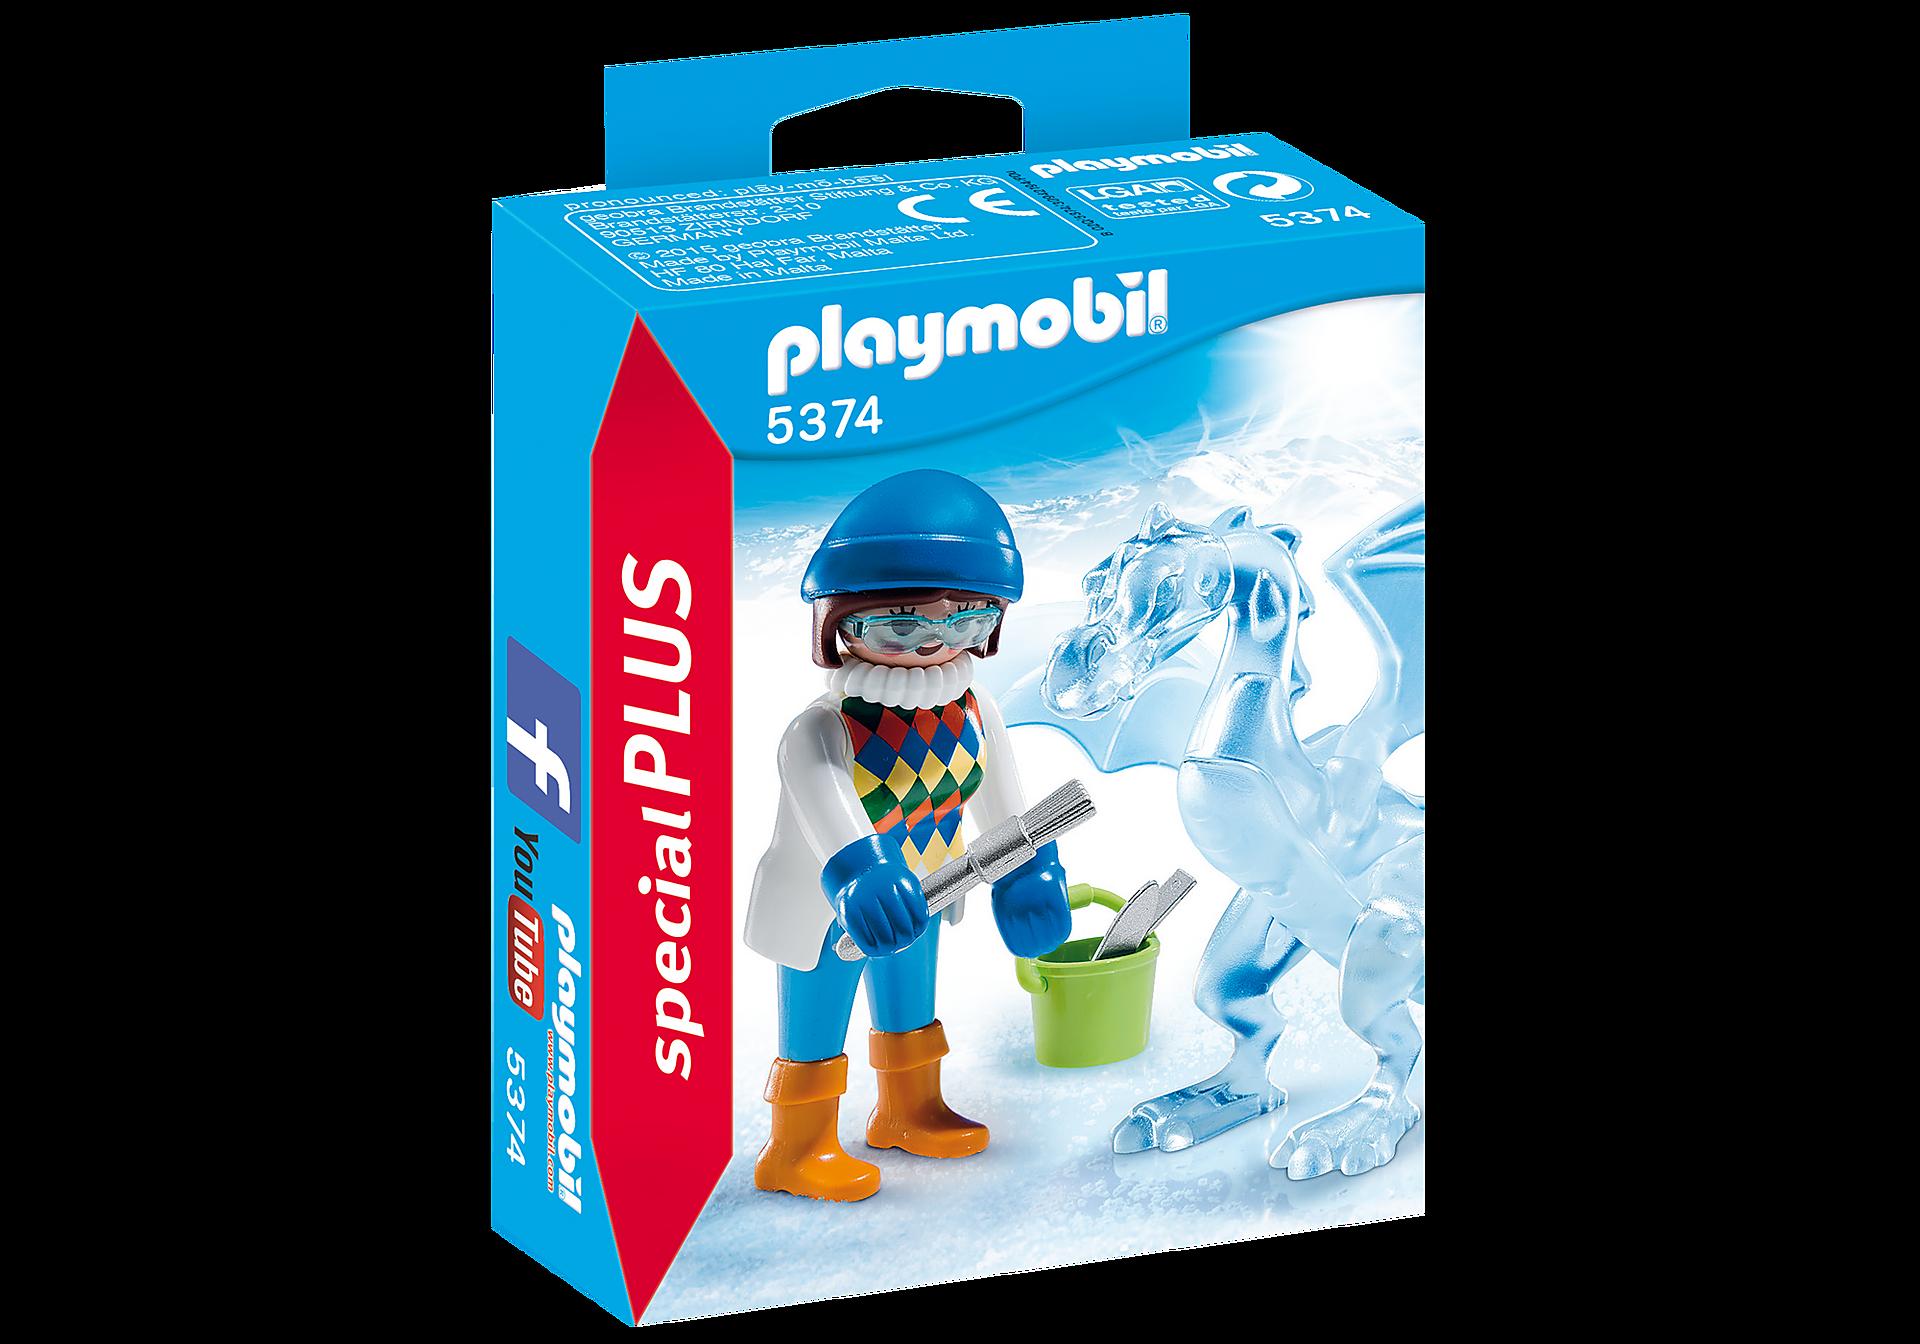 http://media.playmobil.com/i/playmobil/5374_product_box_front/Künstlerin mit Eisskulptur